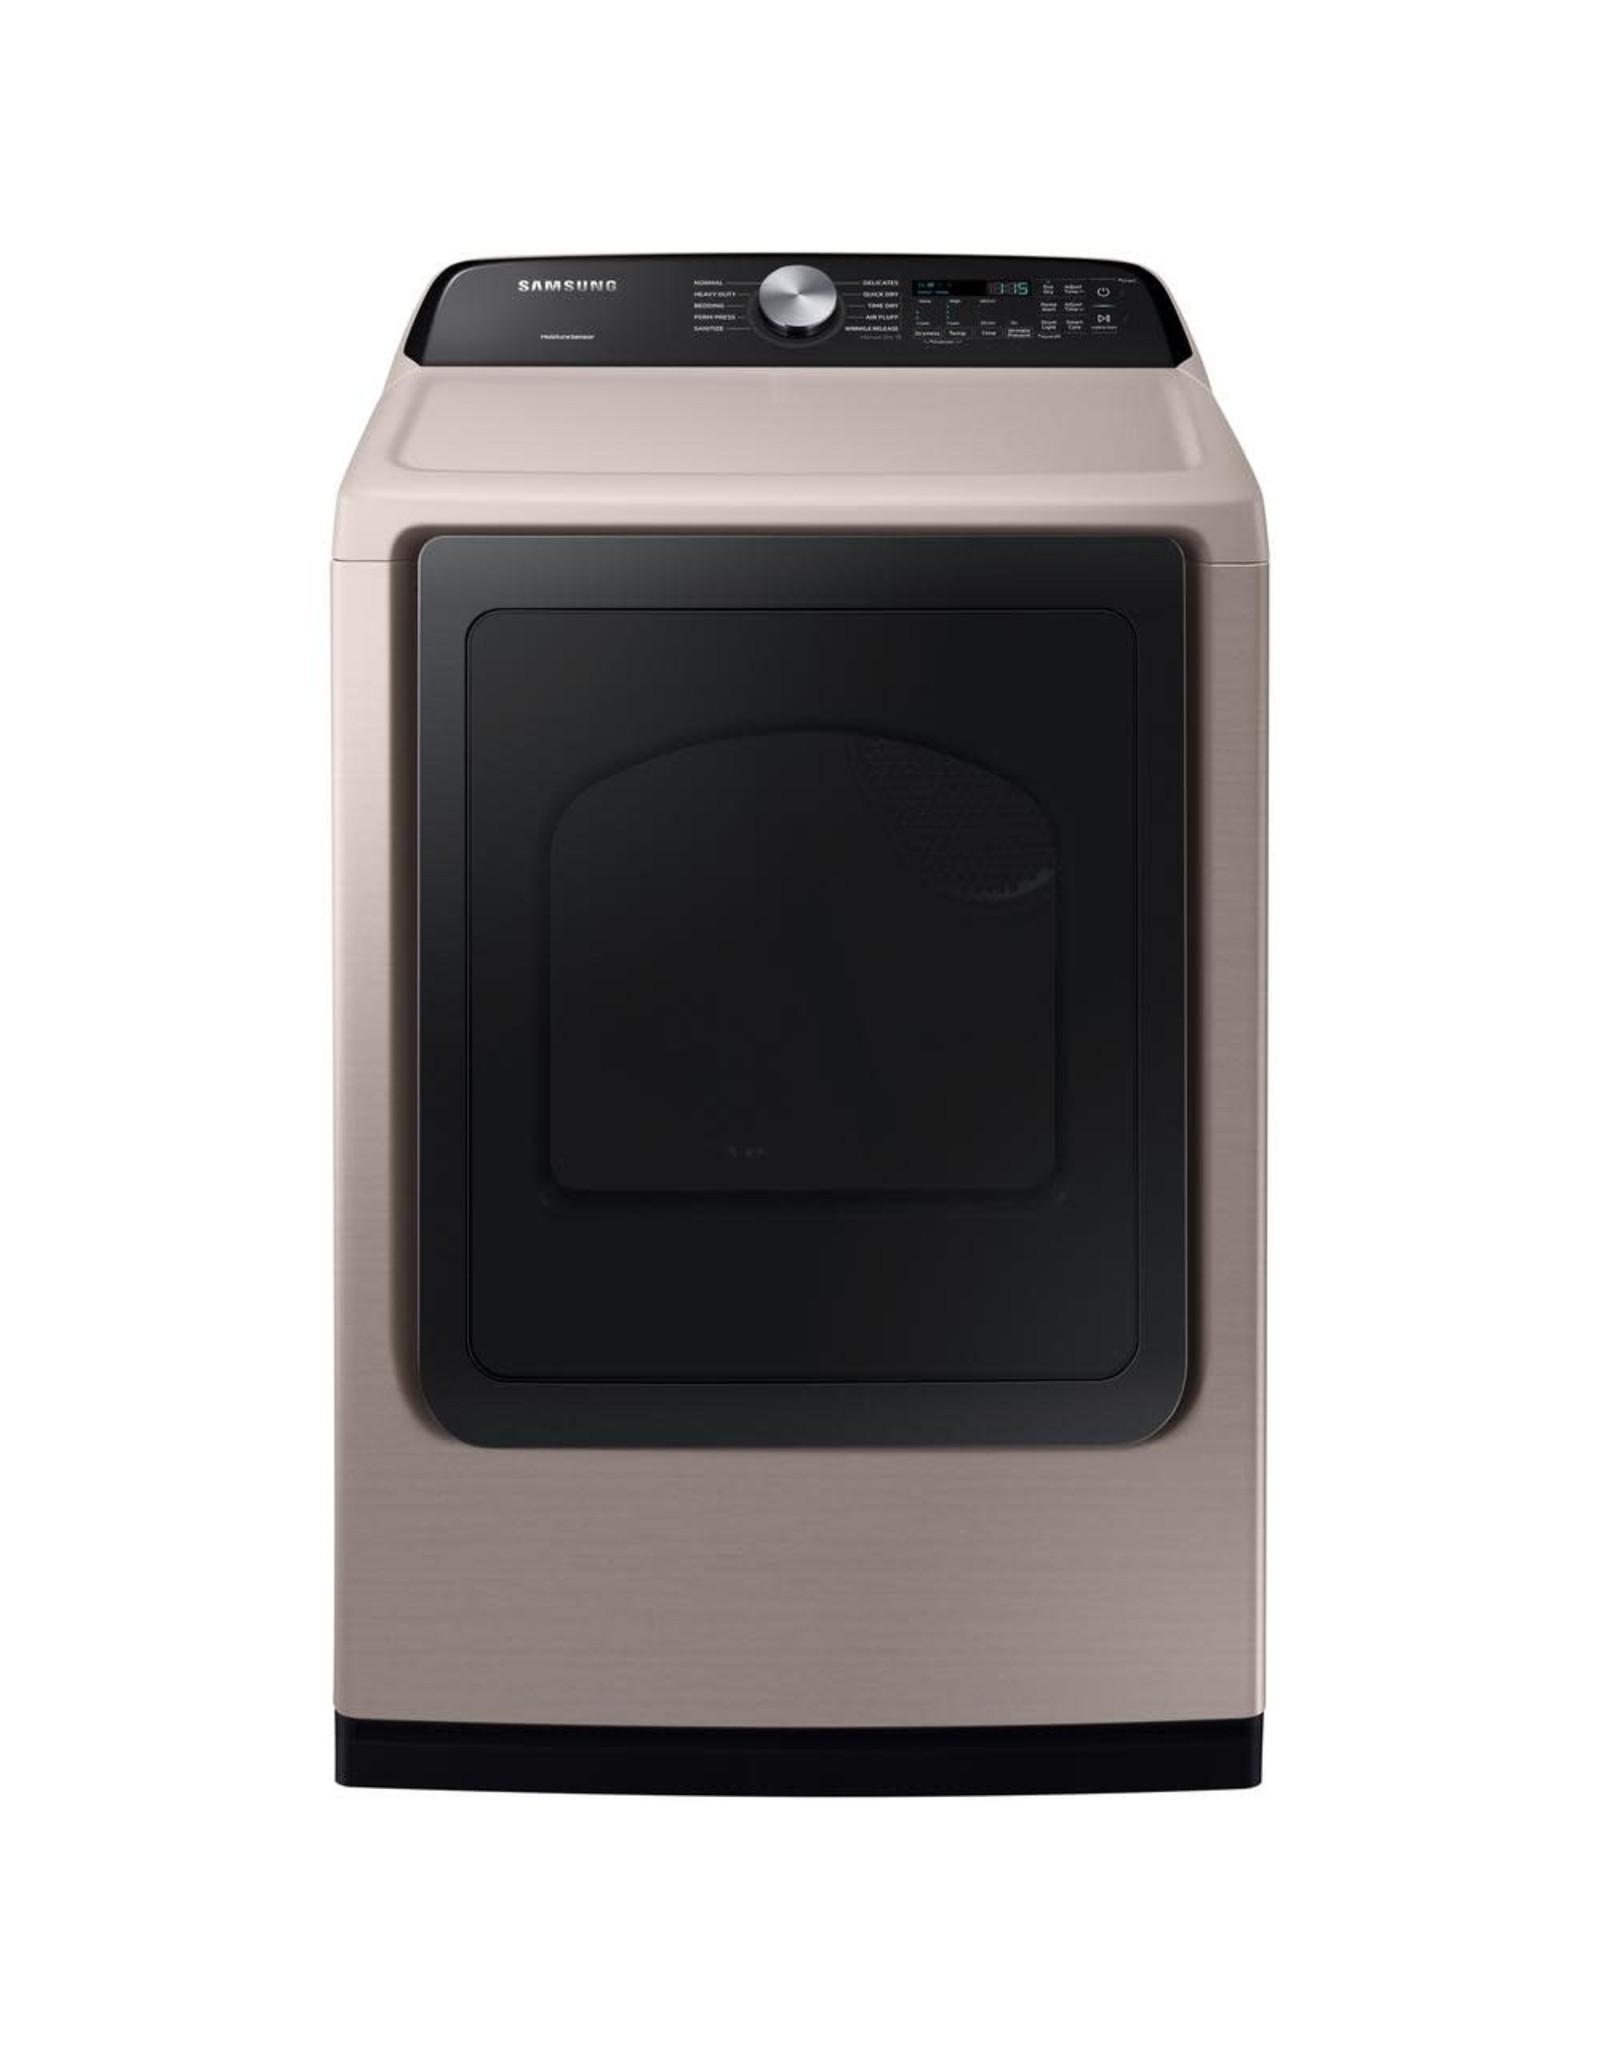 SAMSUNG DVE50T5300C Samsung 7.4 cu. ft. 240-Volt Champagne Electric Dryer with Sensor Dry